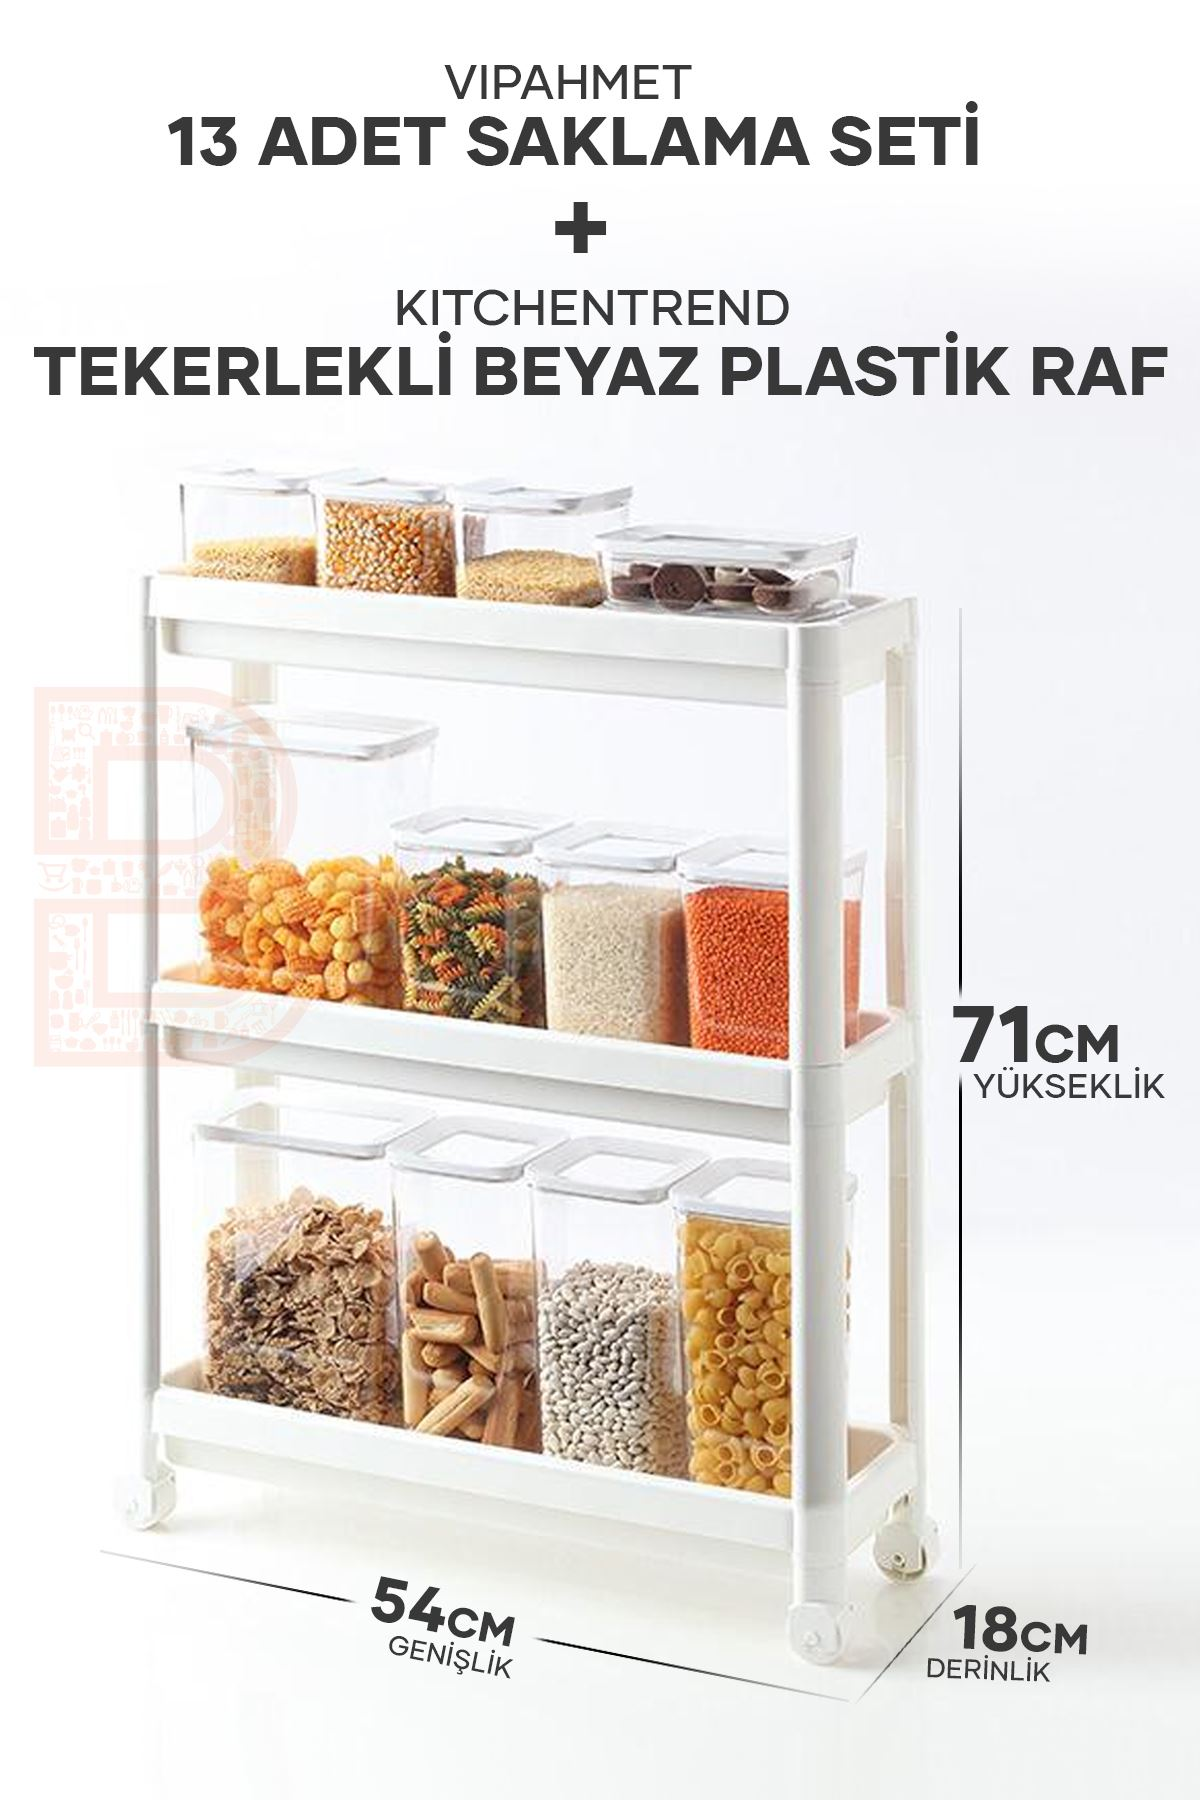 Vip Ahmet 13 Lü Saklama Seti + Kitchen Trend Tekerlekli Beyaz Plastik Raf